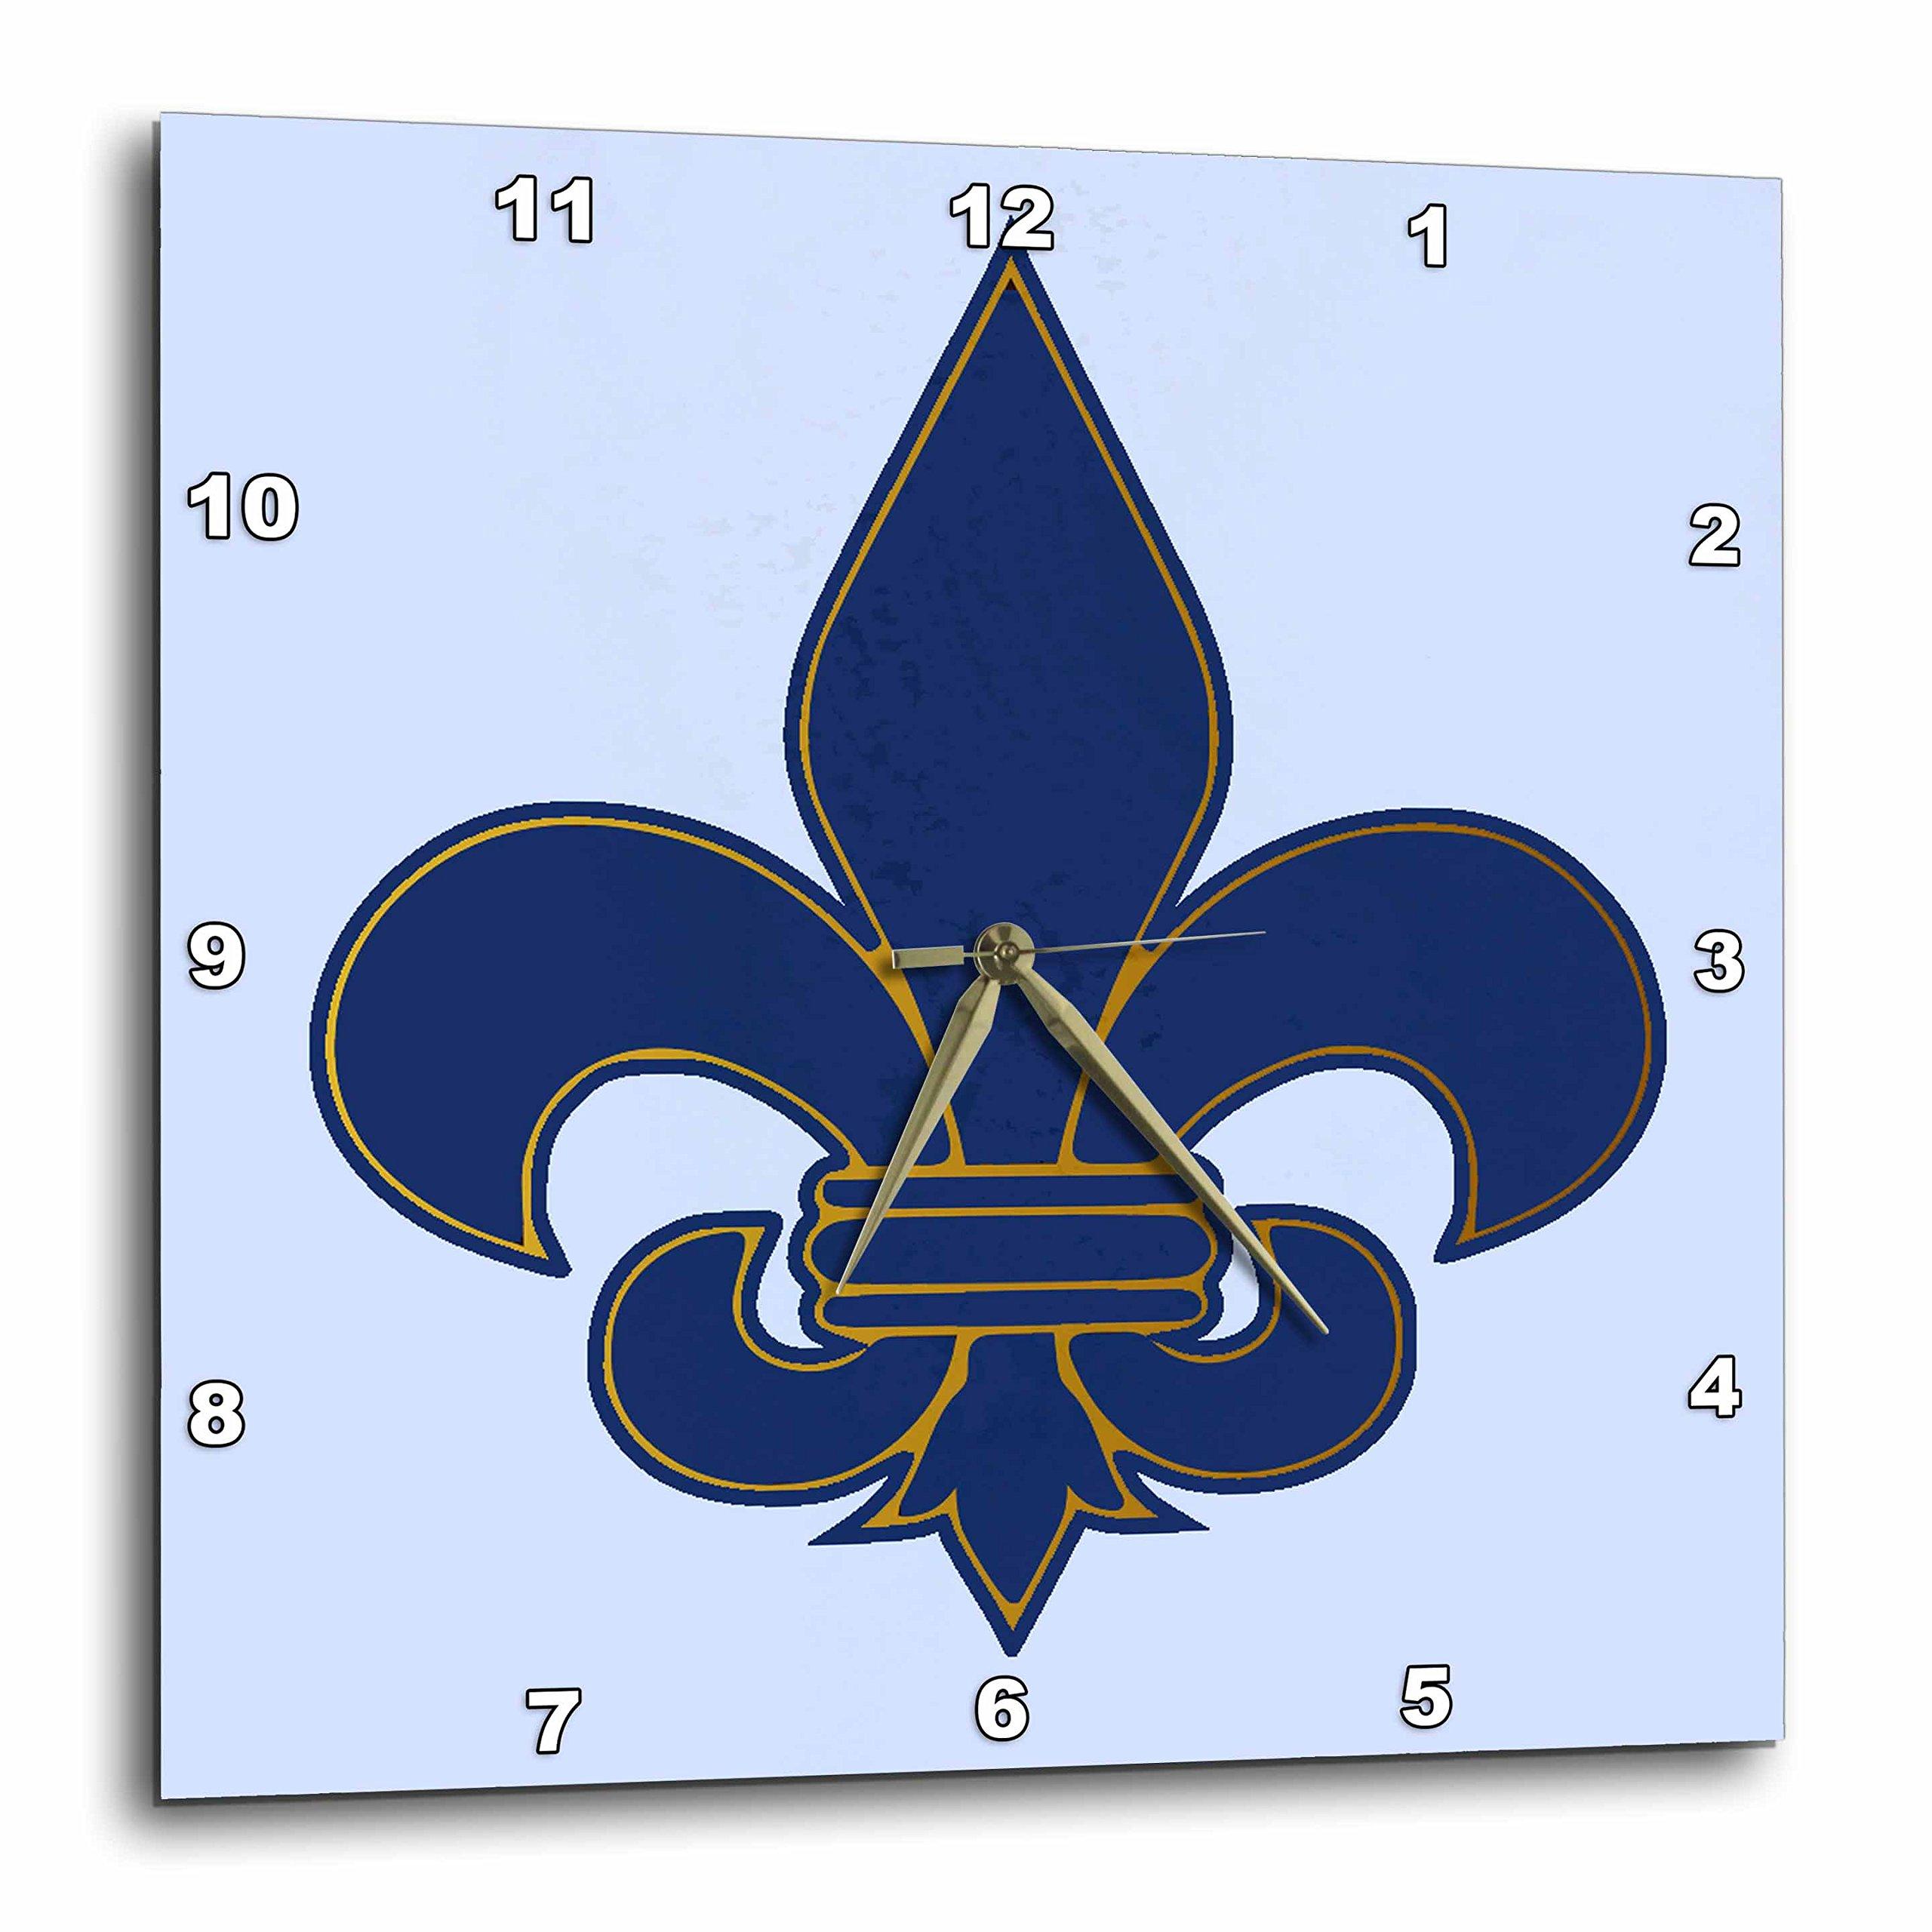 3dRose dpp_22361_1 Large Navy Blue and Gold Fleur de lis Christian Saints Symbol Wall Clock, 10 by 10-Inch